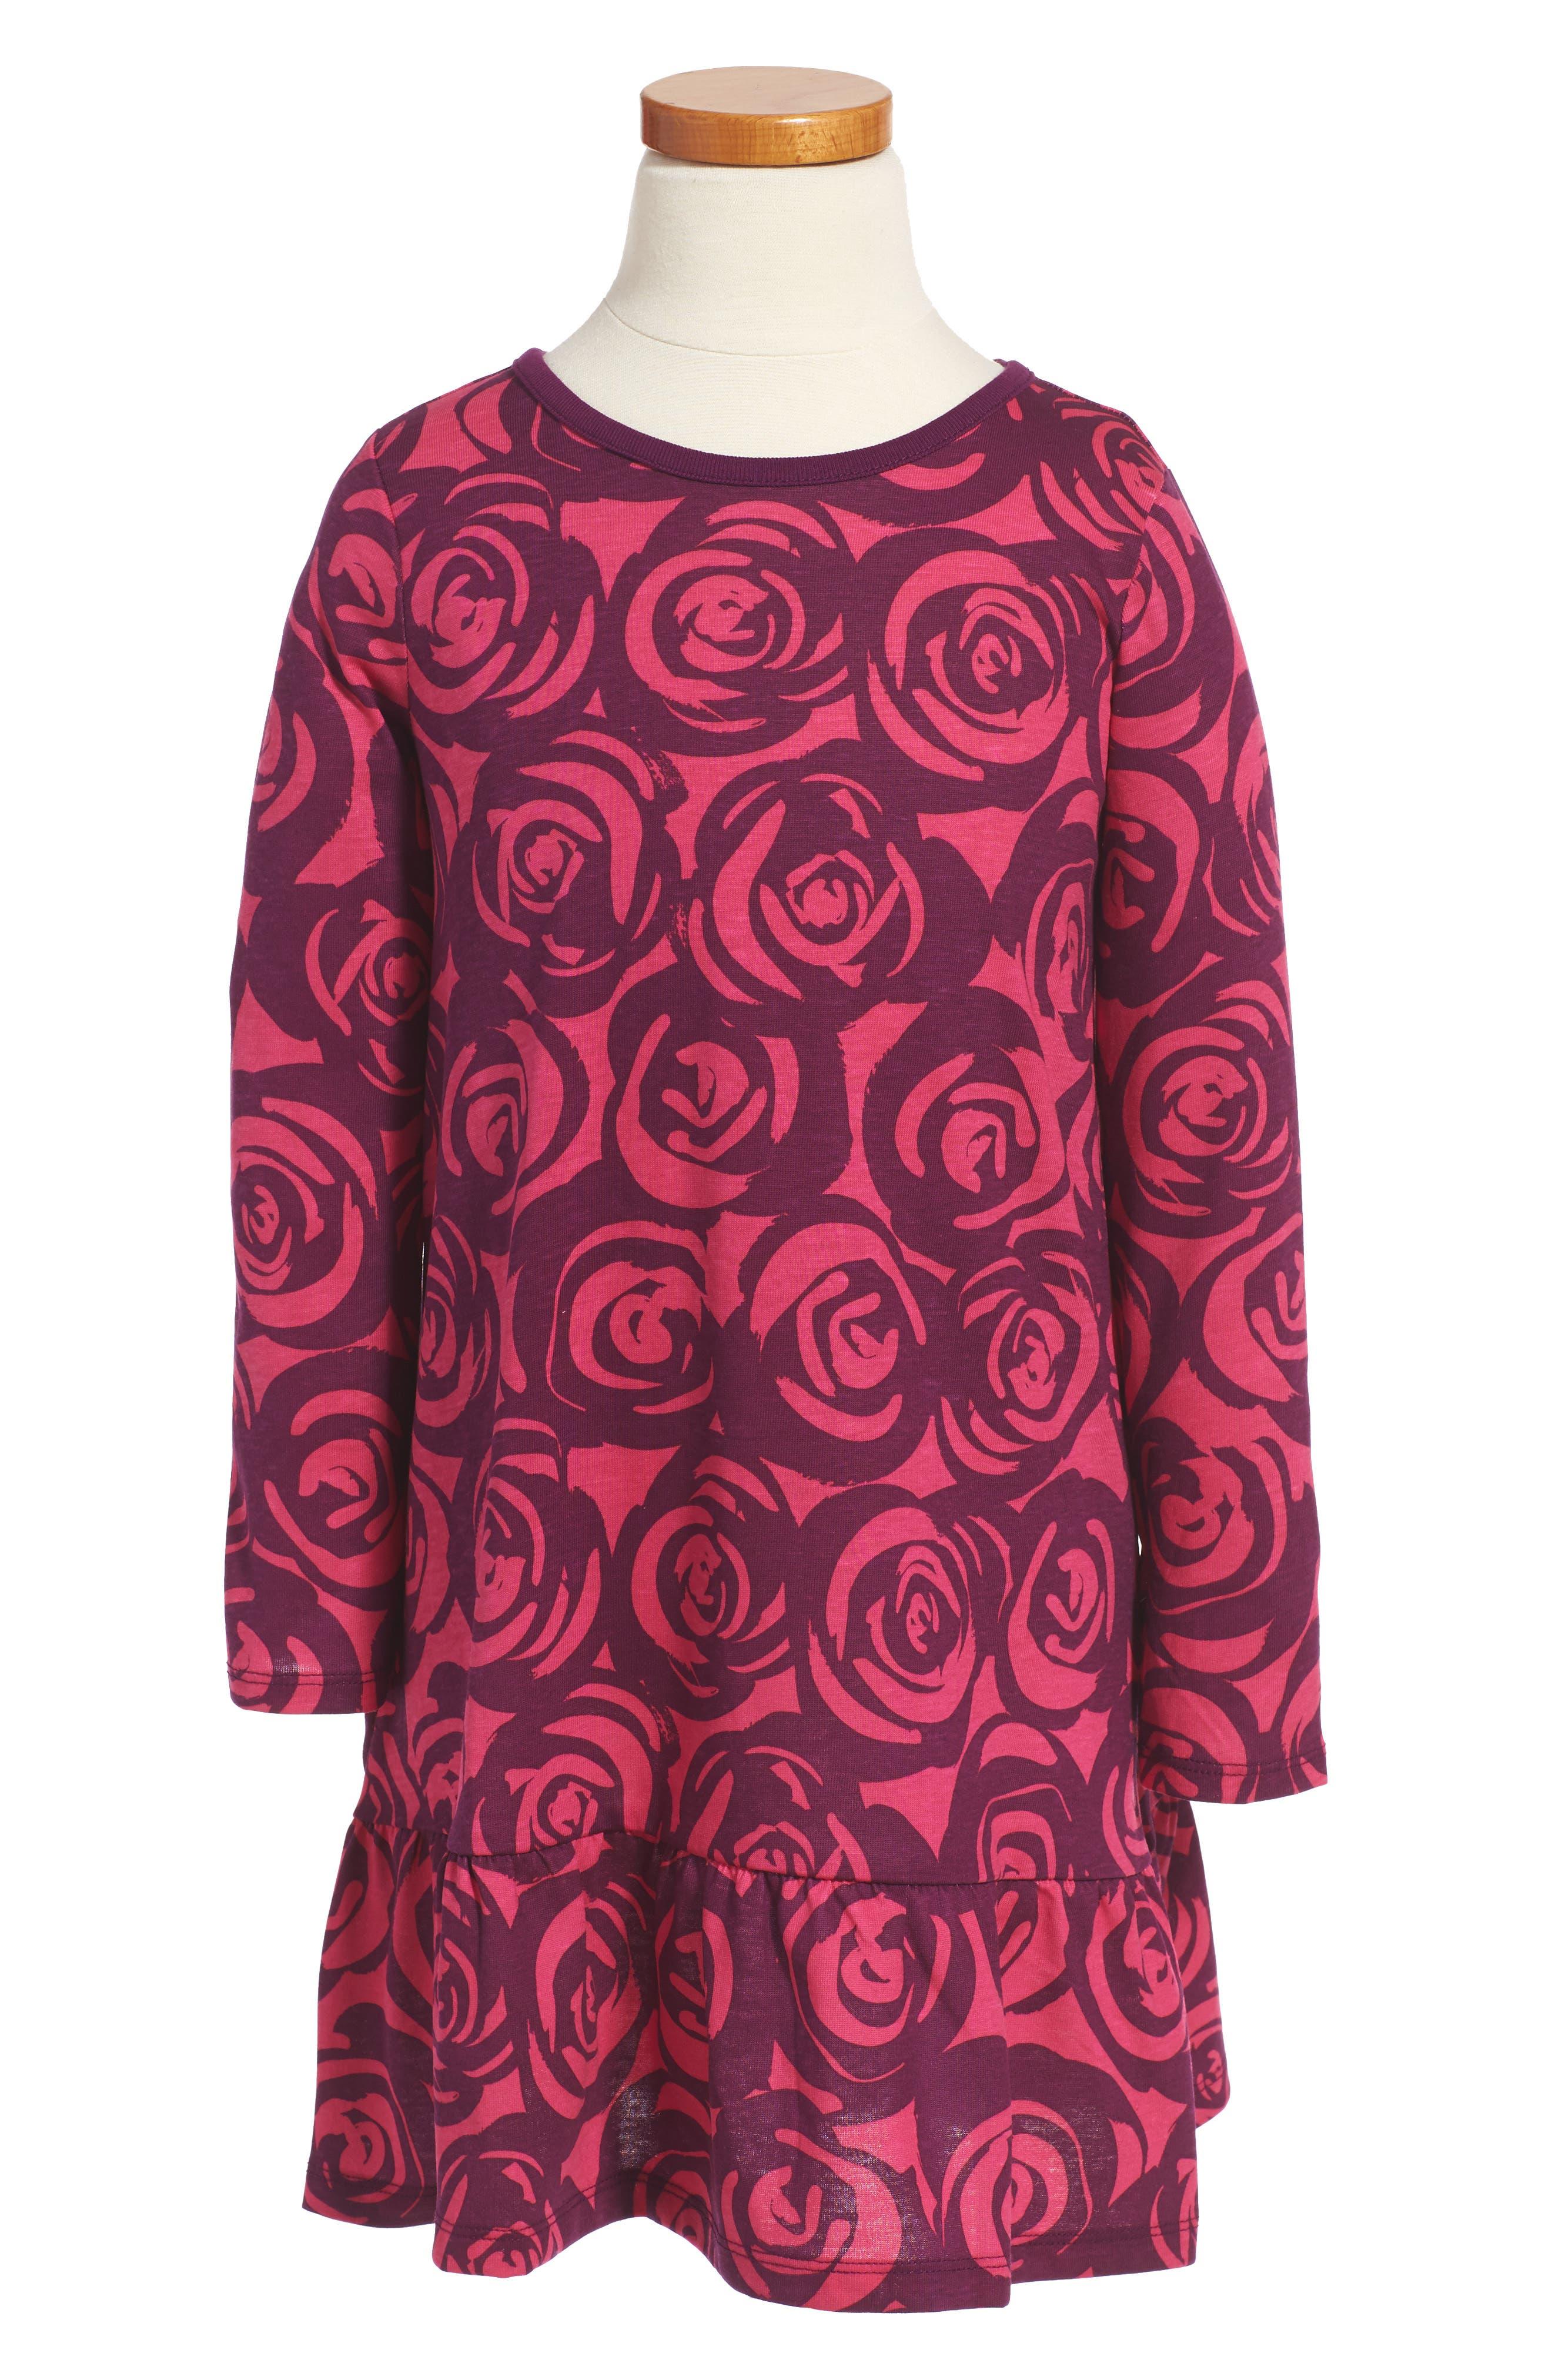 Rennie Rose Ruffle Dress,                         Main,                         color, 651